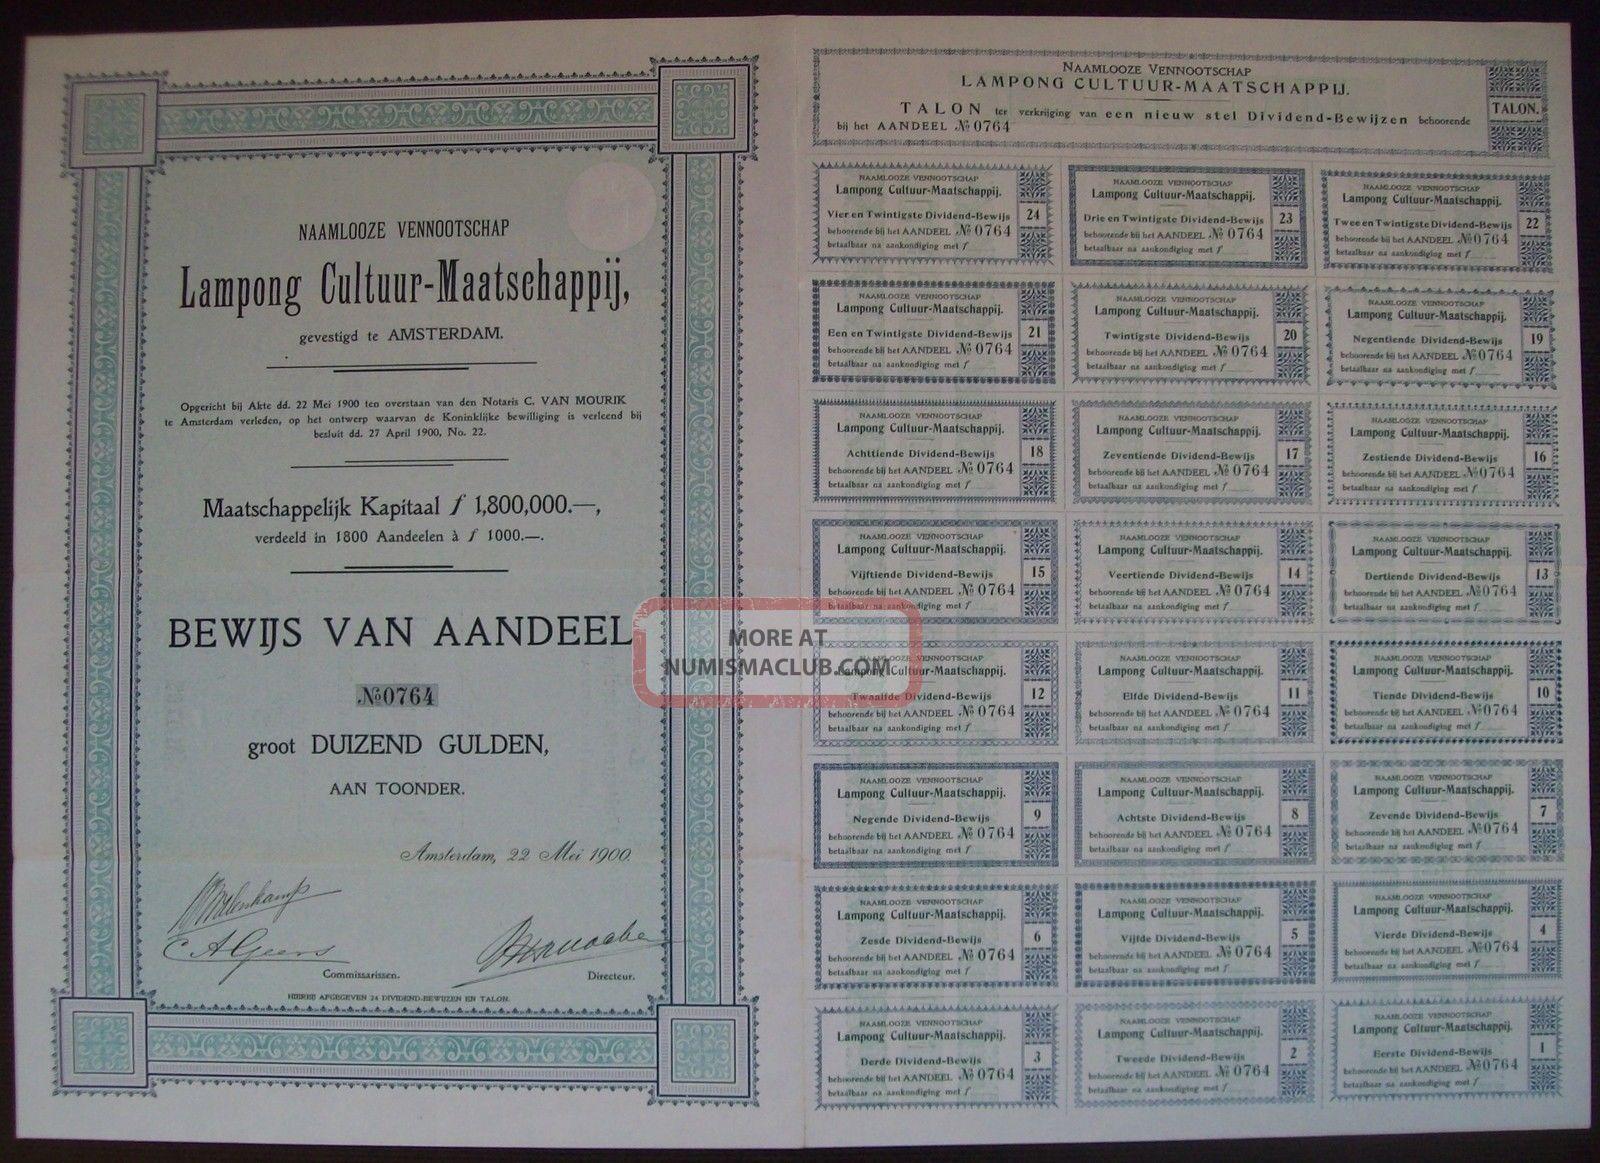 Netherlands 1900 Bond With Coupons Lampong Cultuur Maatschappij Tobacco.  B1526 World photo